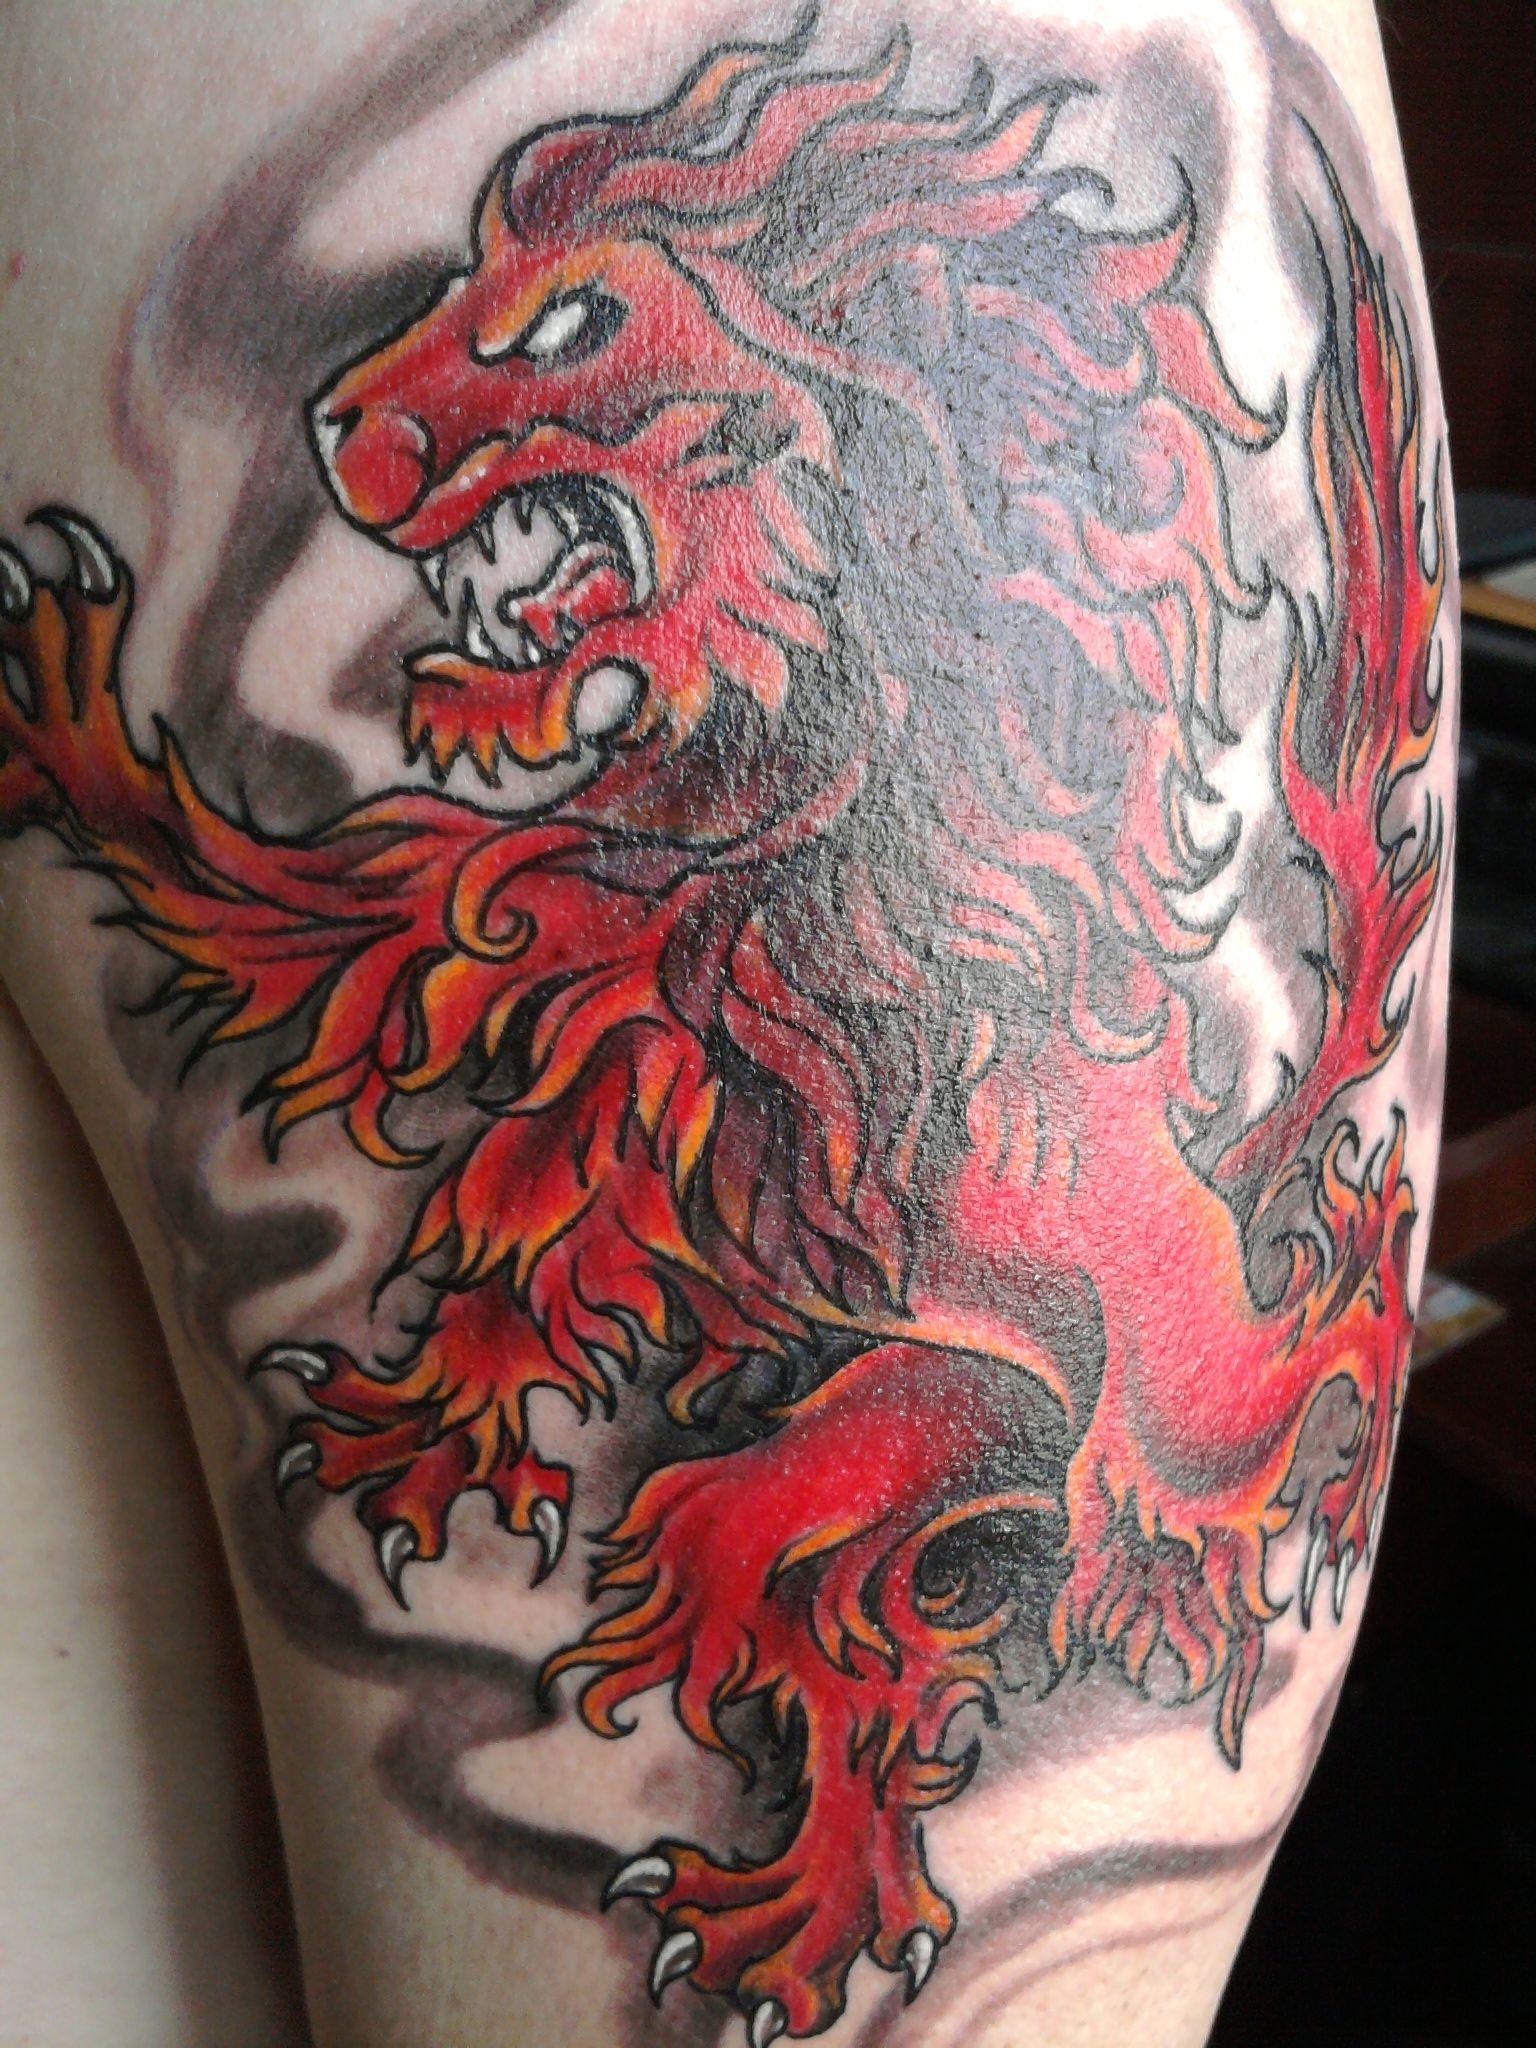 72a09035e My ink. The Scottish lion rampant | Scotland | Pinterest | Tattoo ...